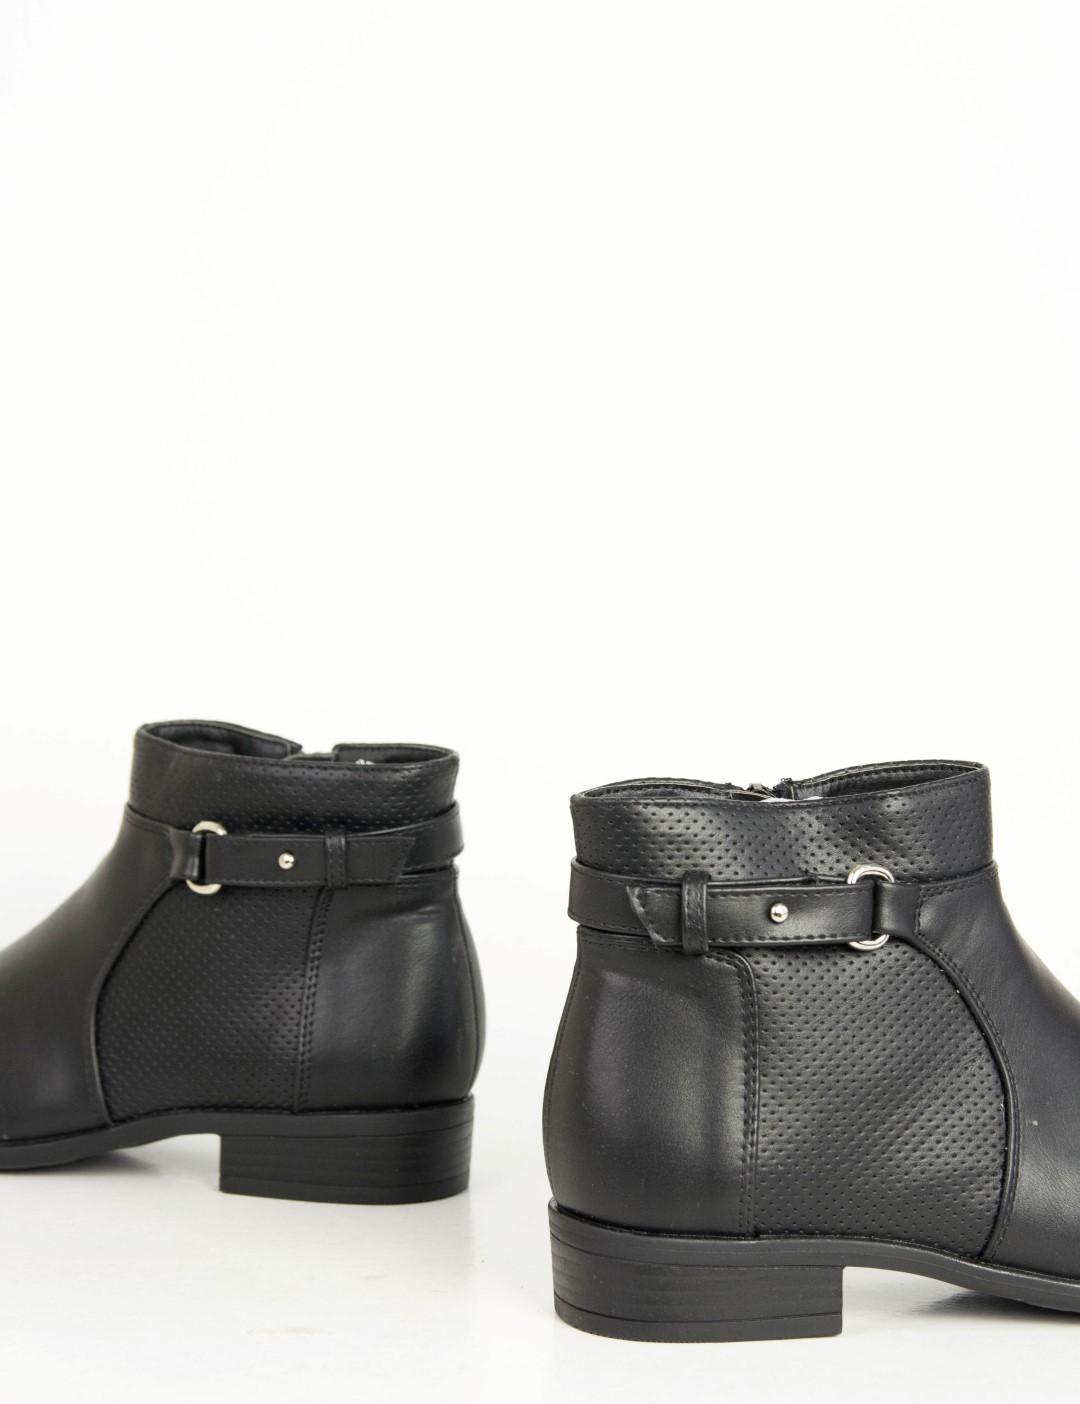 28ccf415cf4 Γυναικεία Παπούτσια, Γυναικεία Μποτάκια, Μποτάκια Χωρίς Τακούνι